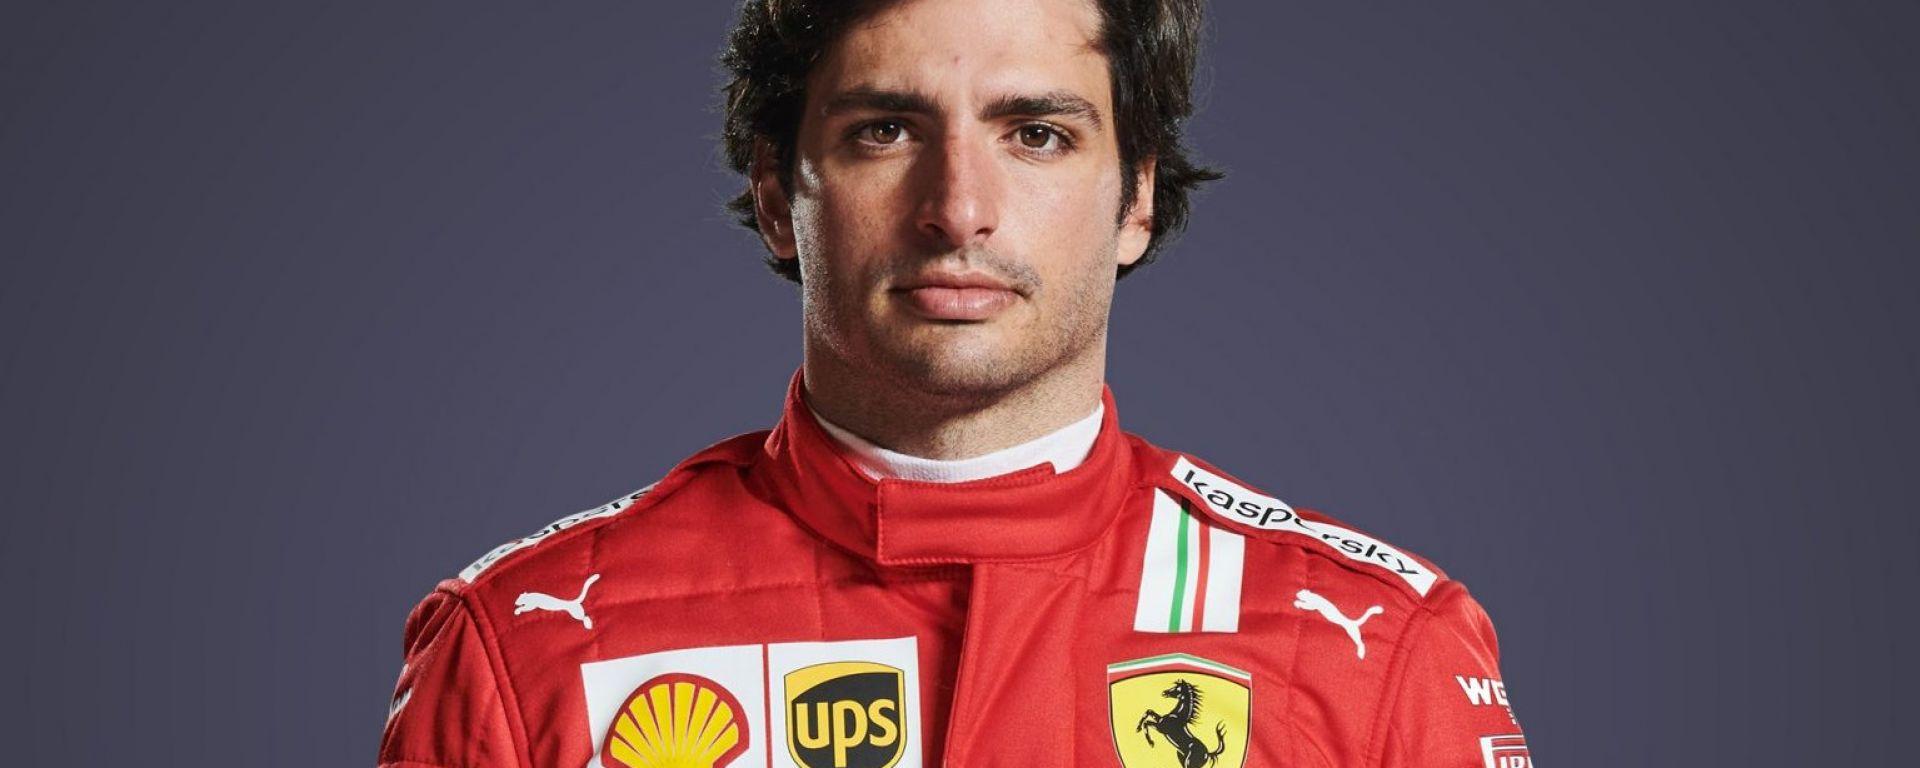 Carlos Sainz Jr #55 F1 2021